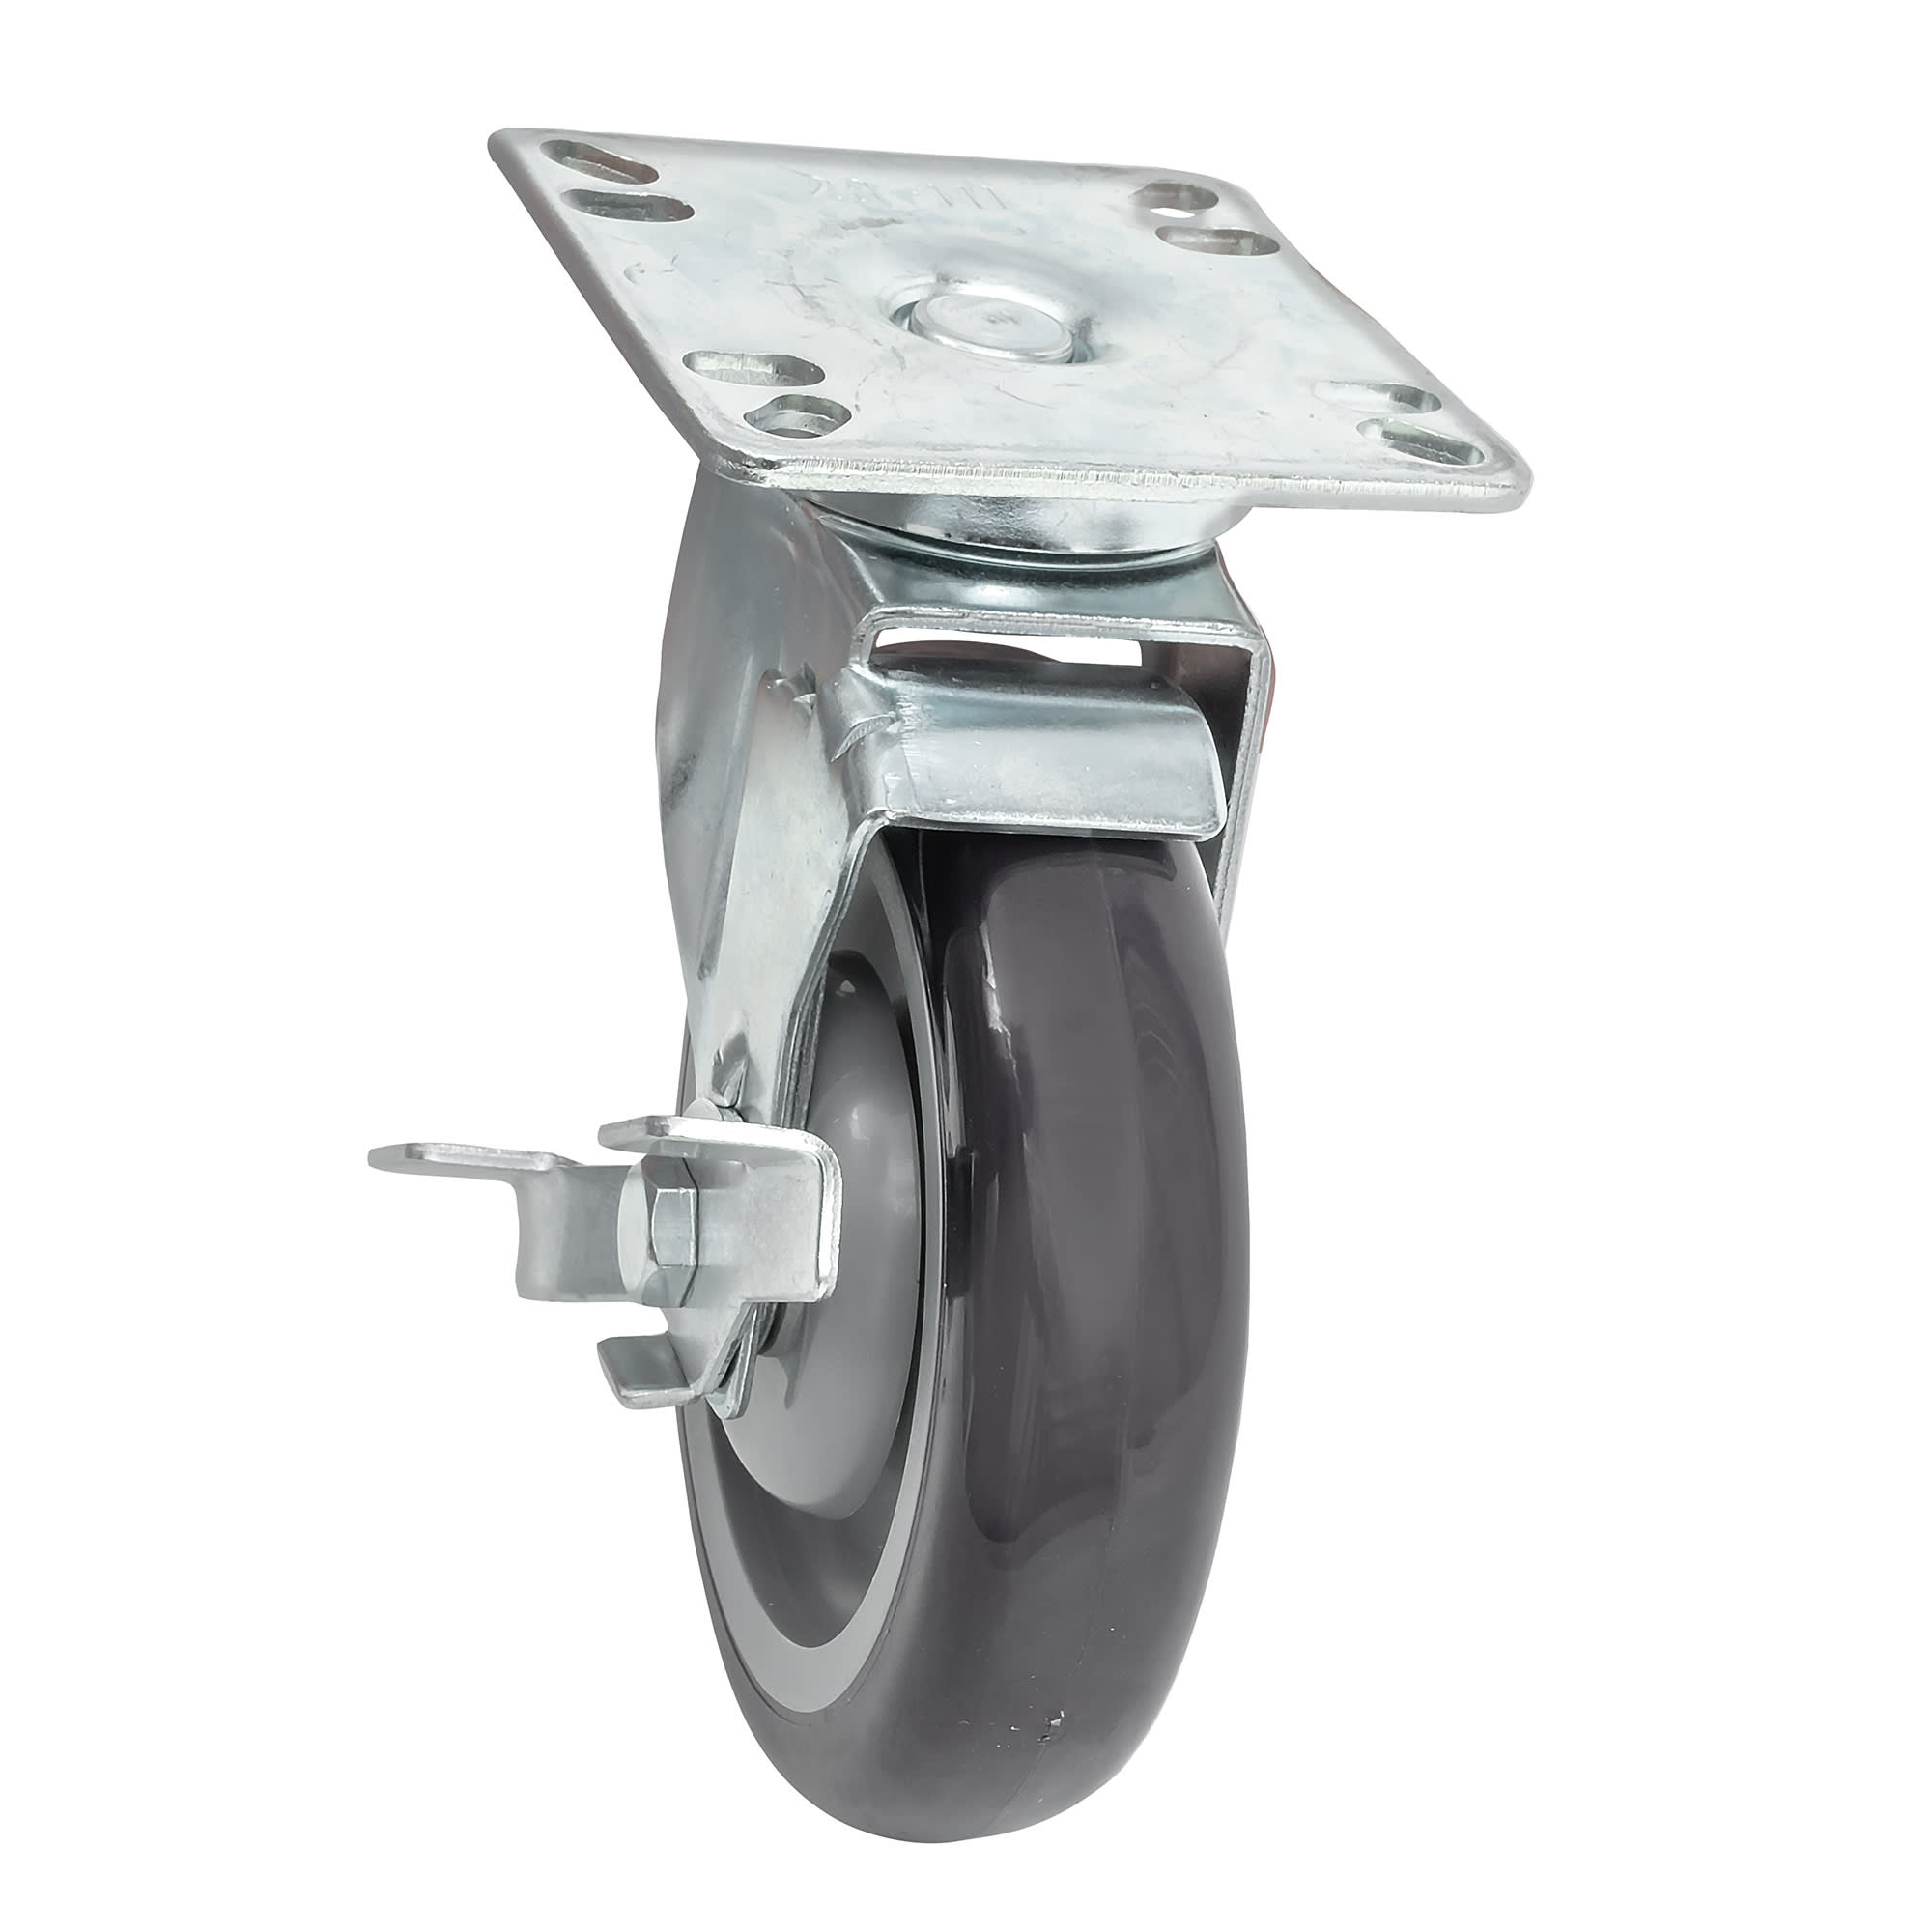 "Krowne 28-111S 4-Piece Universal Plate Caster Set w/ 5"" Wheel, 3.5 x 3.5"""